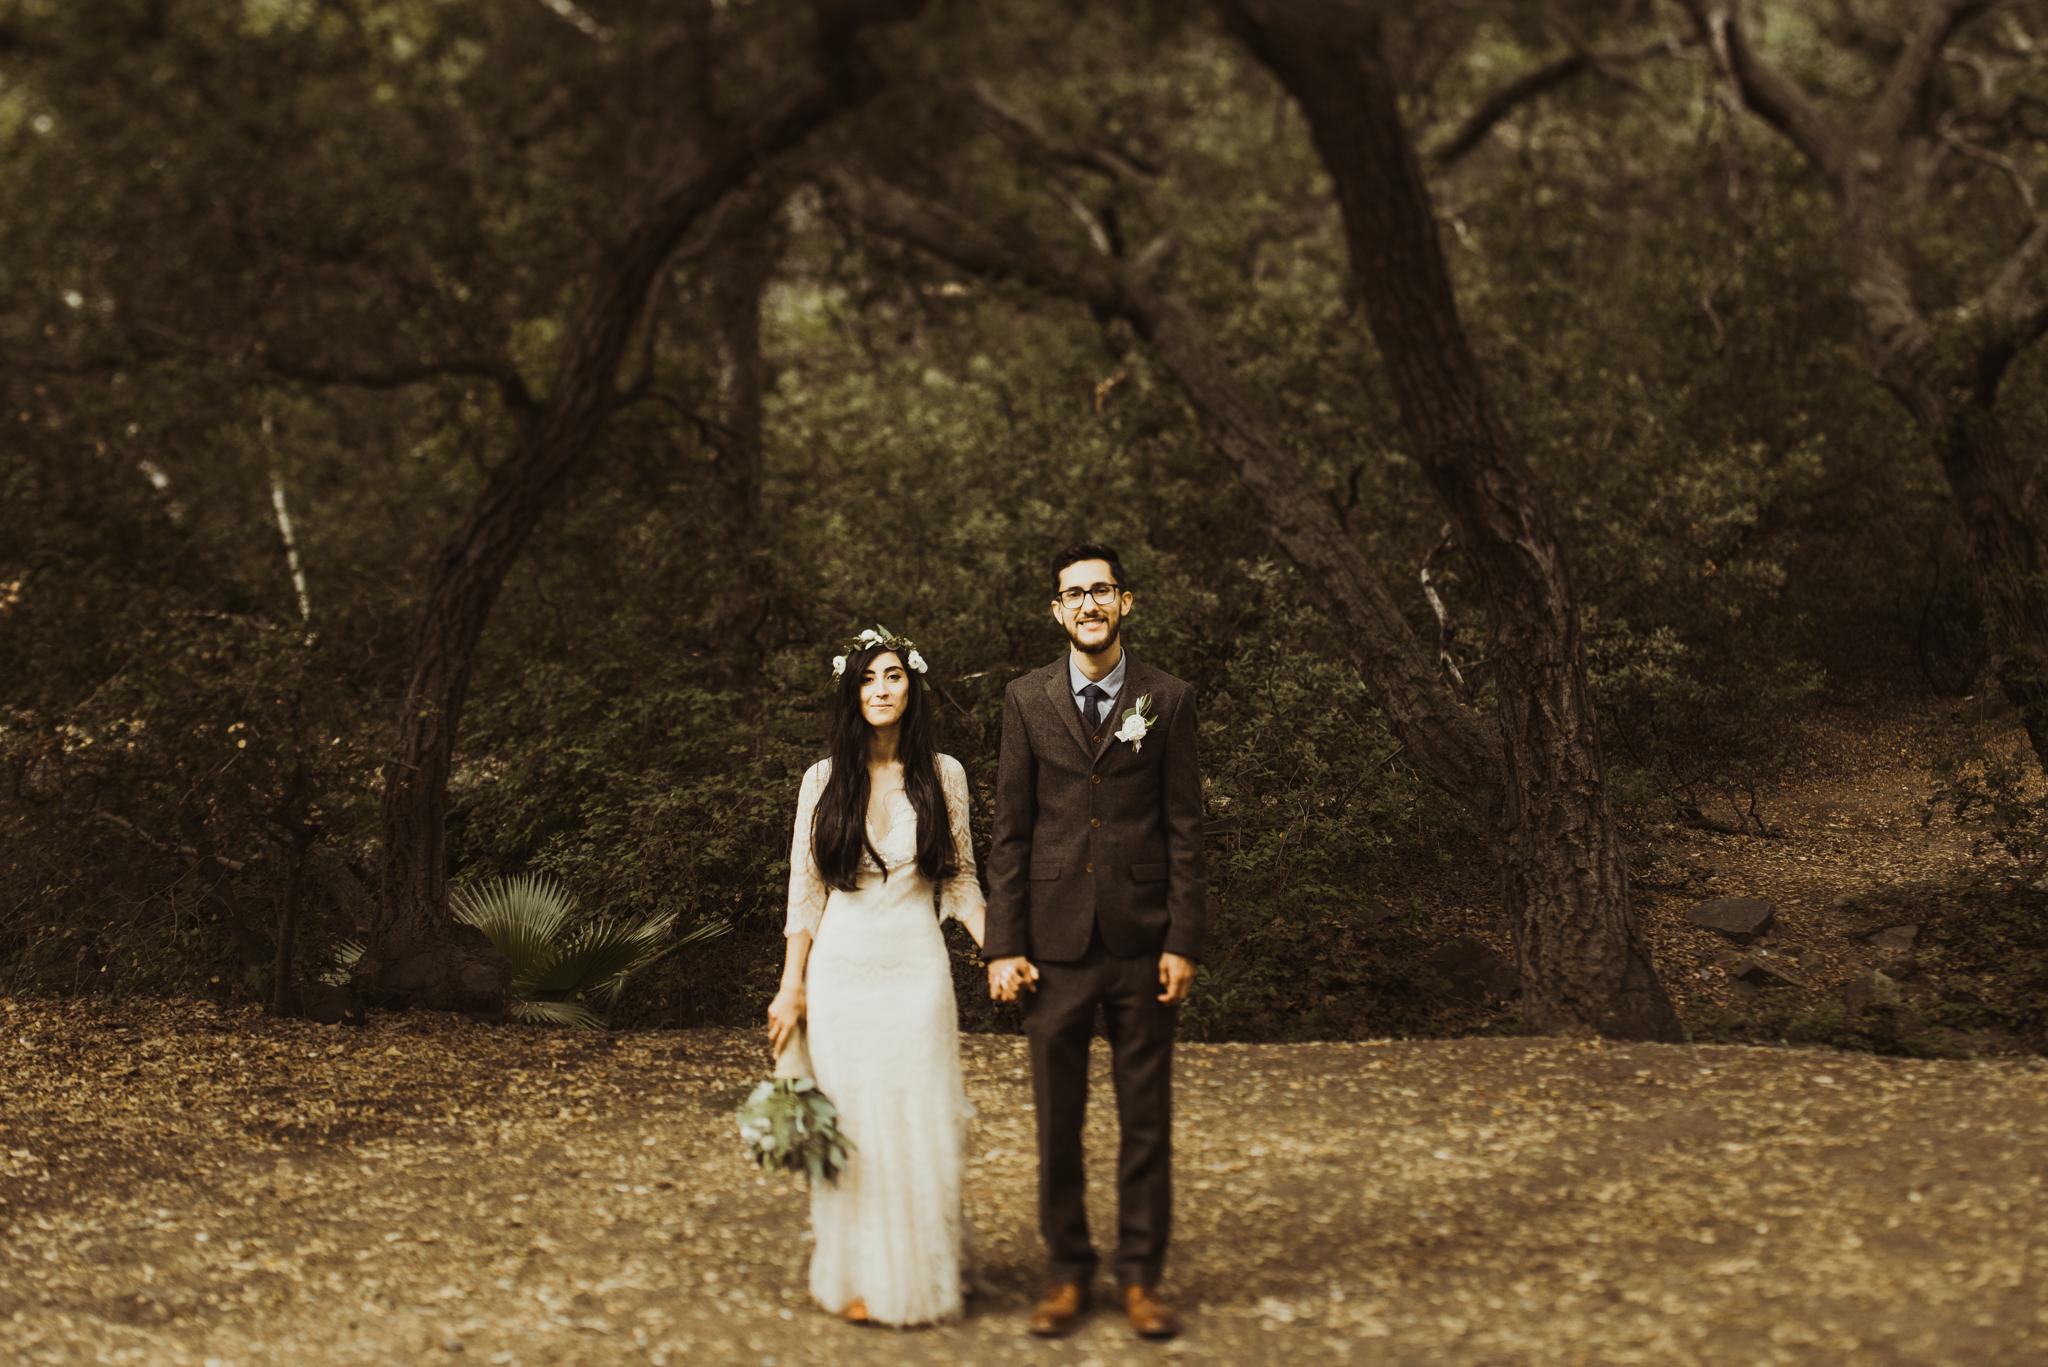 ©Isaiah-&-Taylor-Photography---Oak-Canyon-Nature-Center-Wedding,-Anaheim-Hills-062.jpg